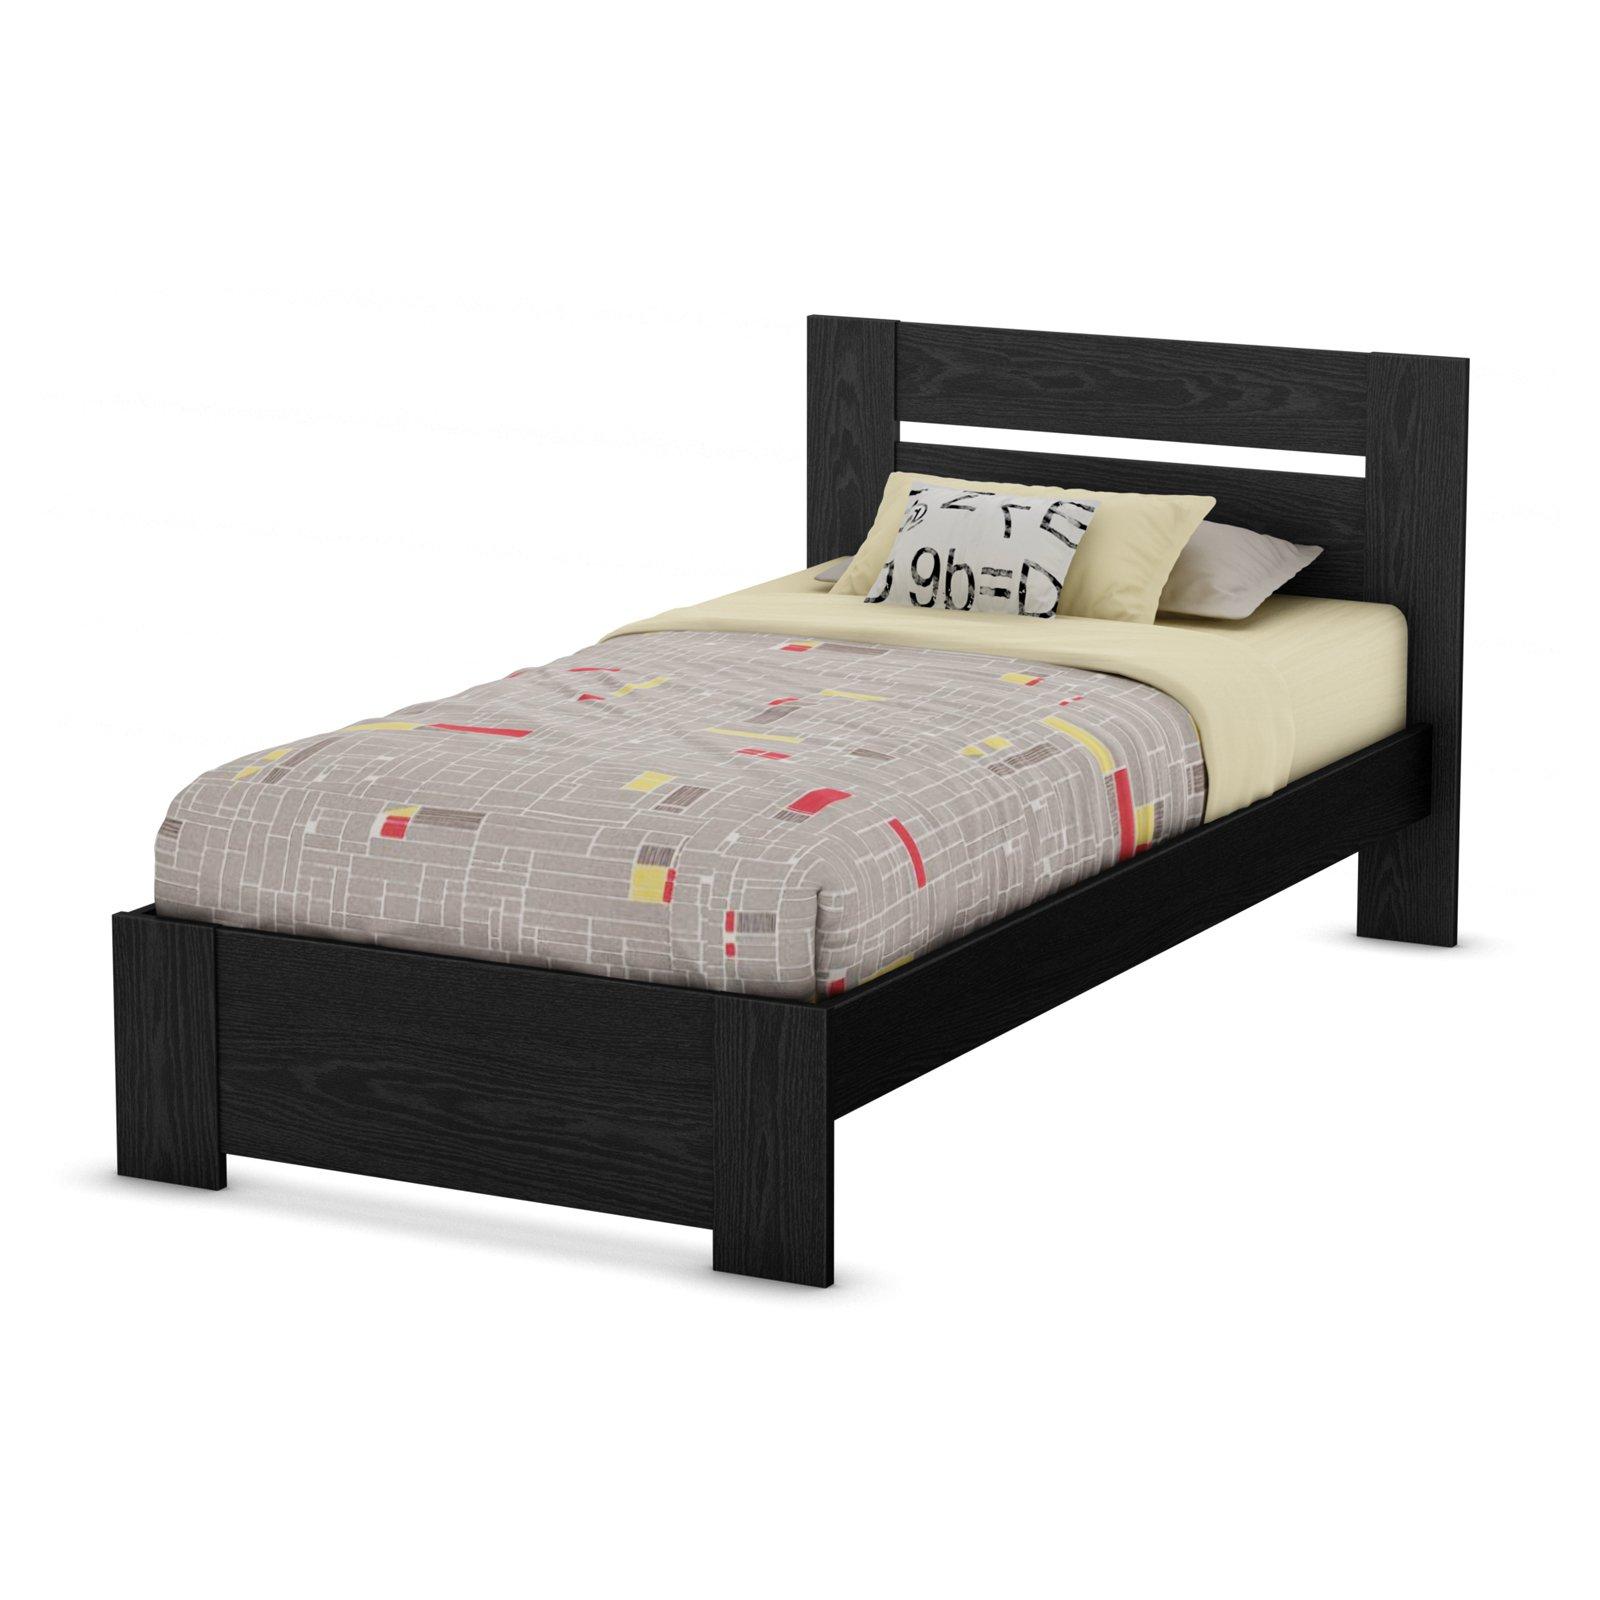 South Shore Flexible Twin Platform Bed, Black Oak Beds